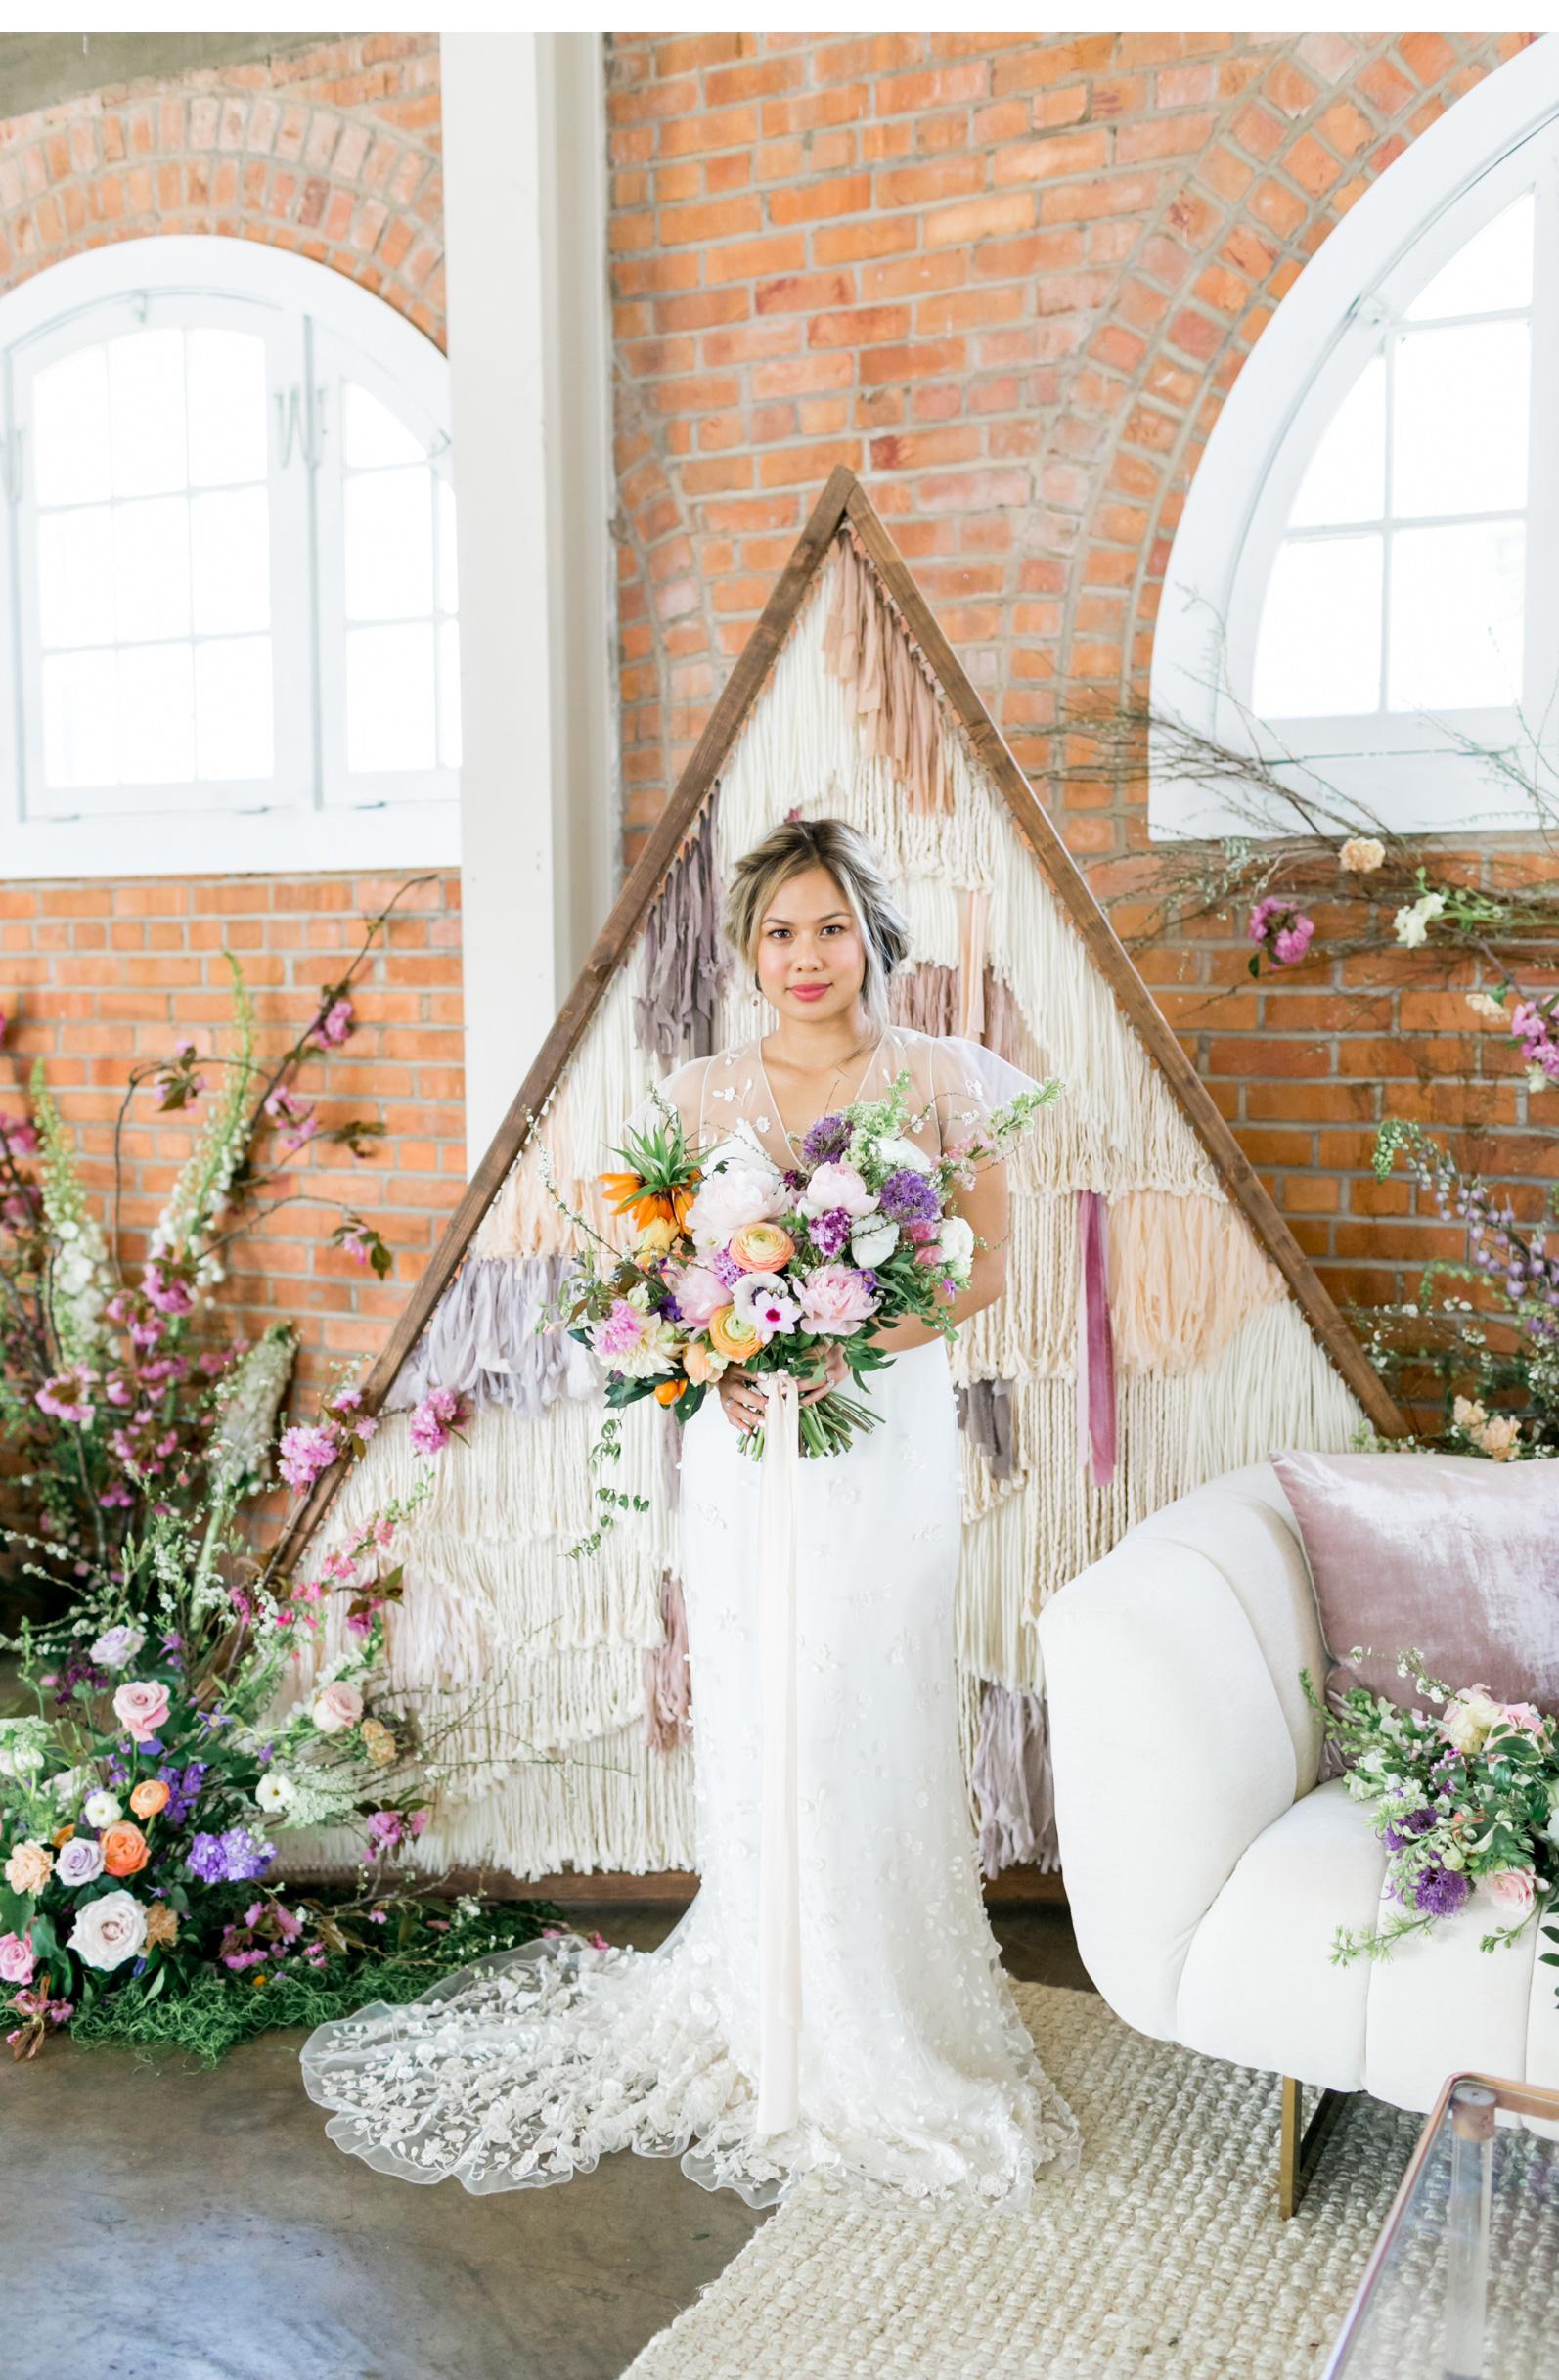 Malibu-Weddings-Natalie-Schutt-Photography-Style-me-Pretty_10.jpg